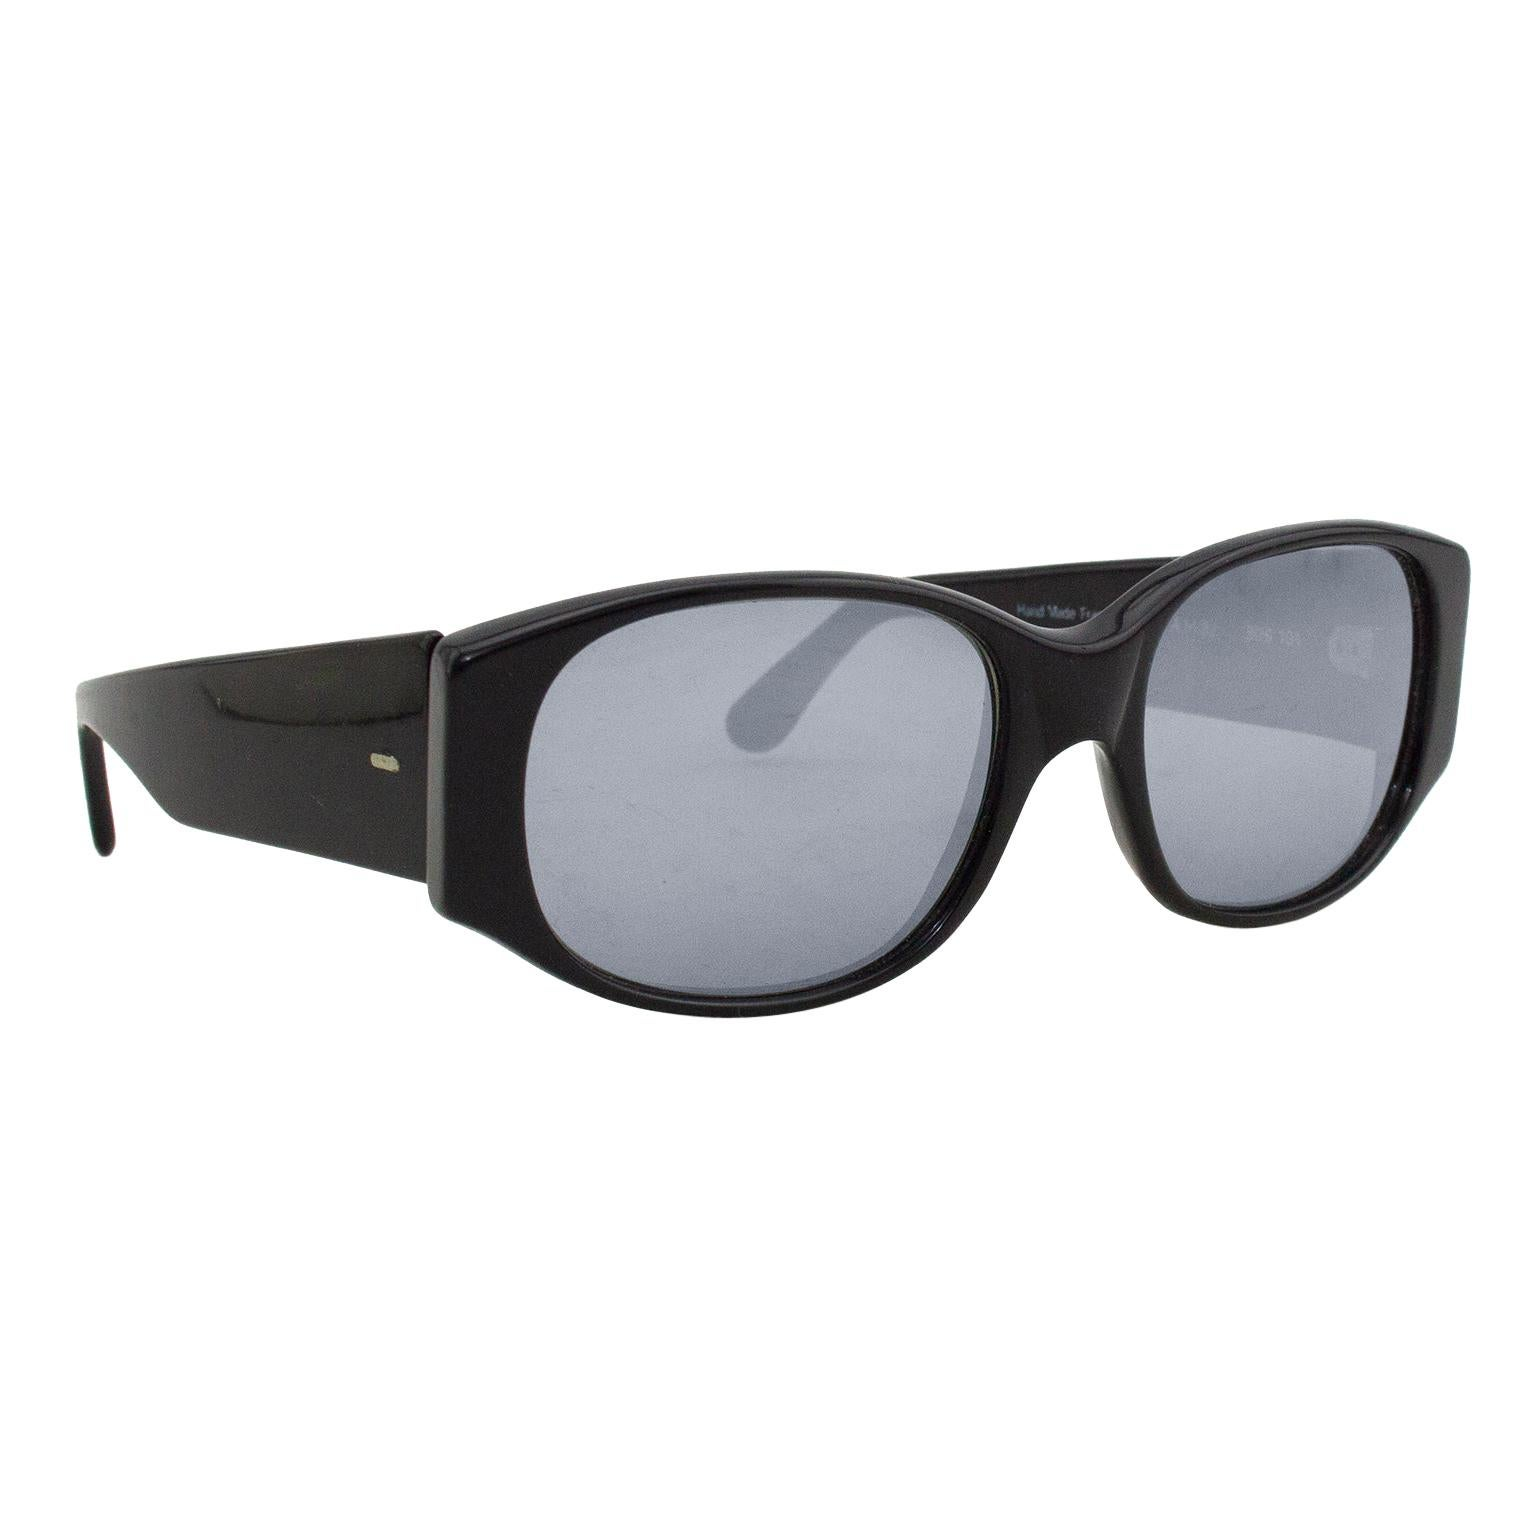 Alain Mikli Black Sunglasses with Mirror Lenses